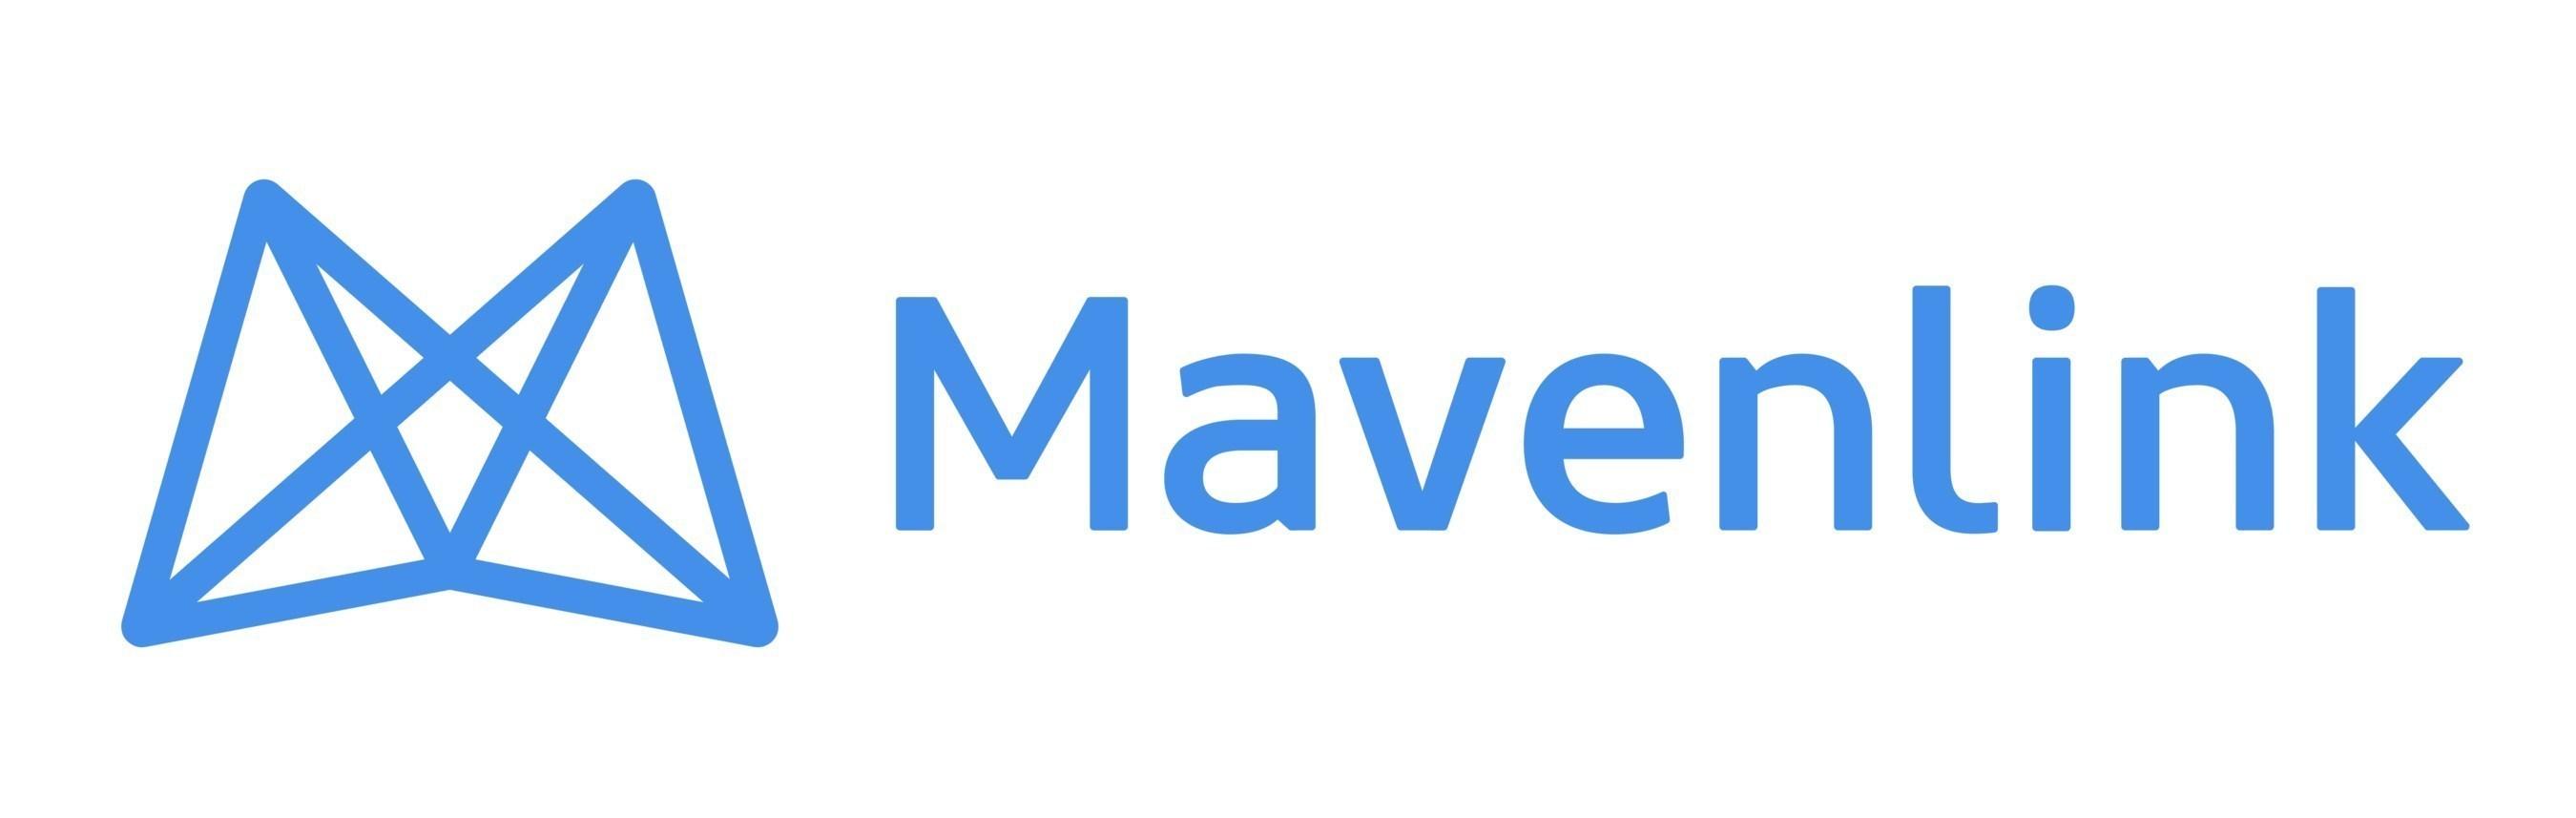 Mavenlink Appoints Klaus Besier, Accomplished Former CEO of SAP Americas, and Raul Fernandez,